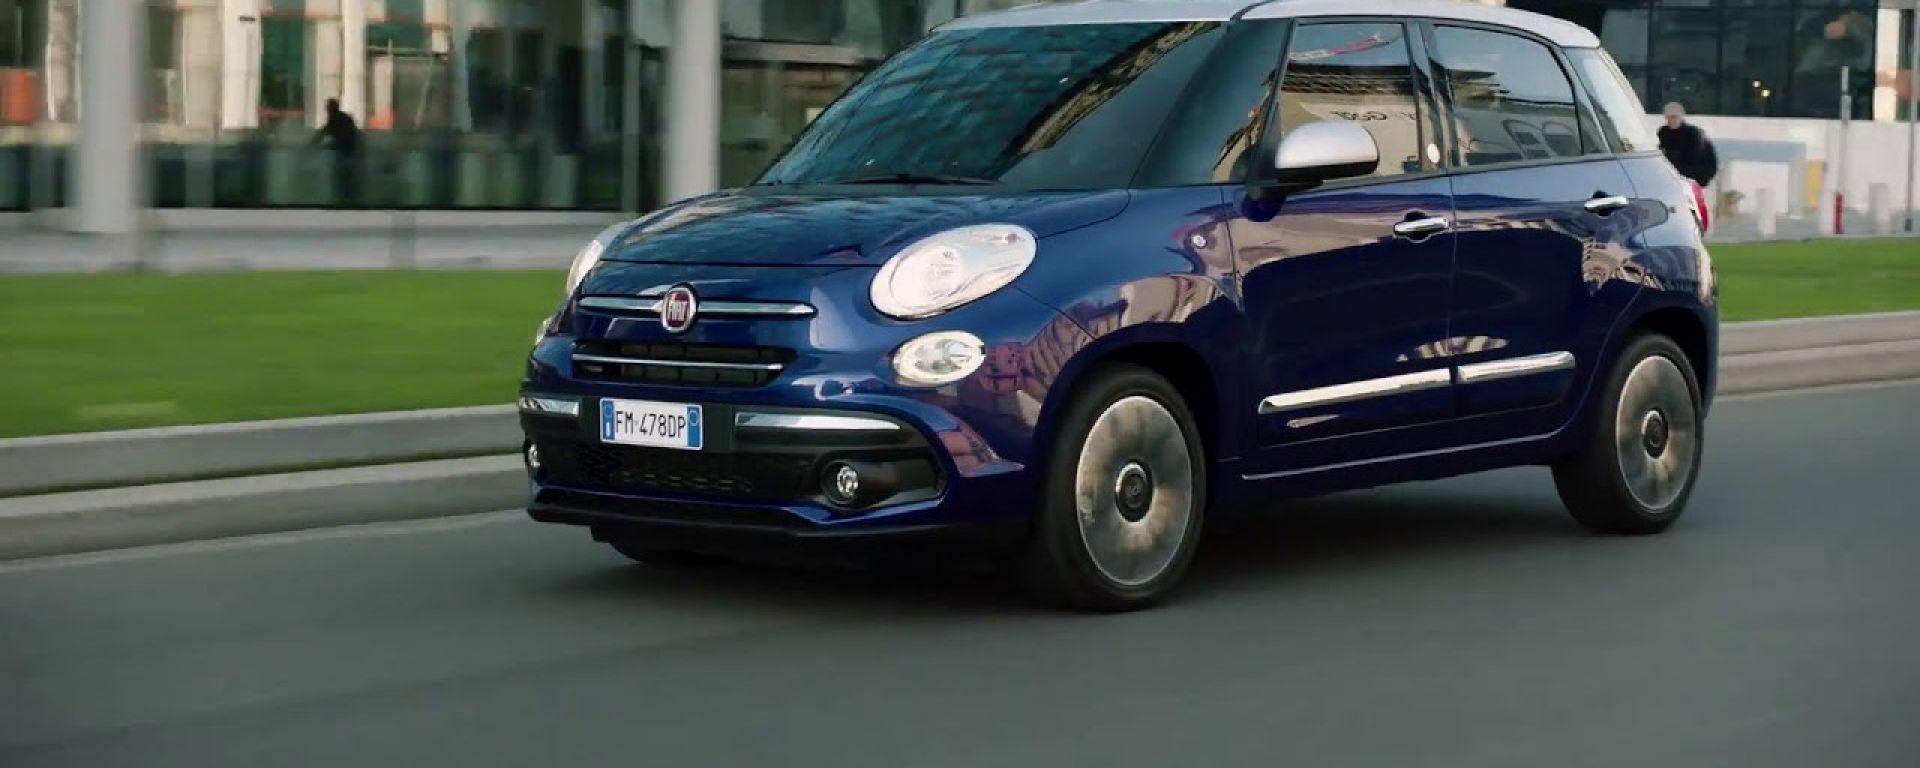 Fiat 500L, quale futuro per il minivan by Fiat?